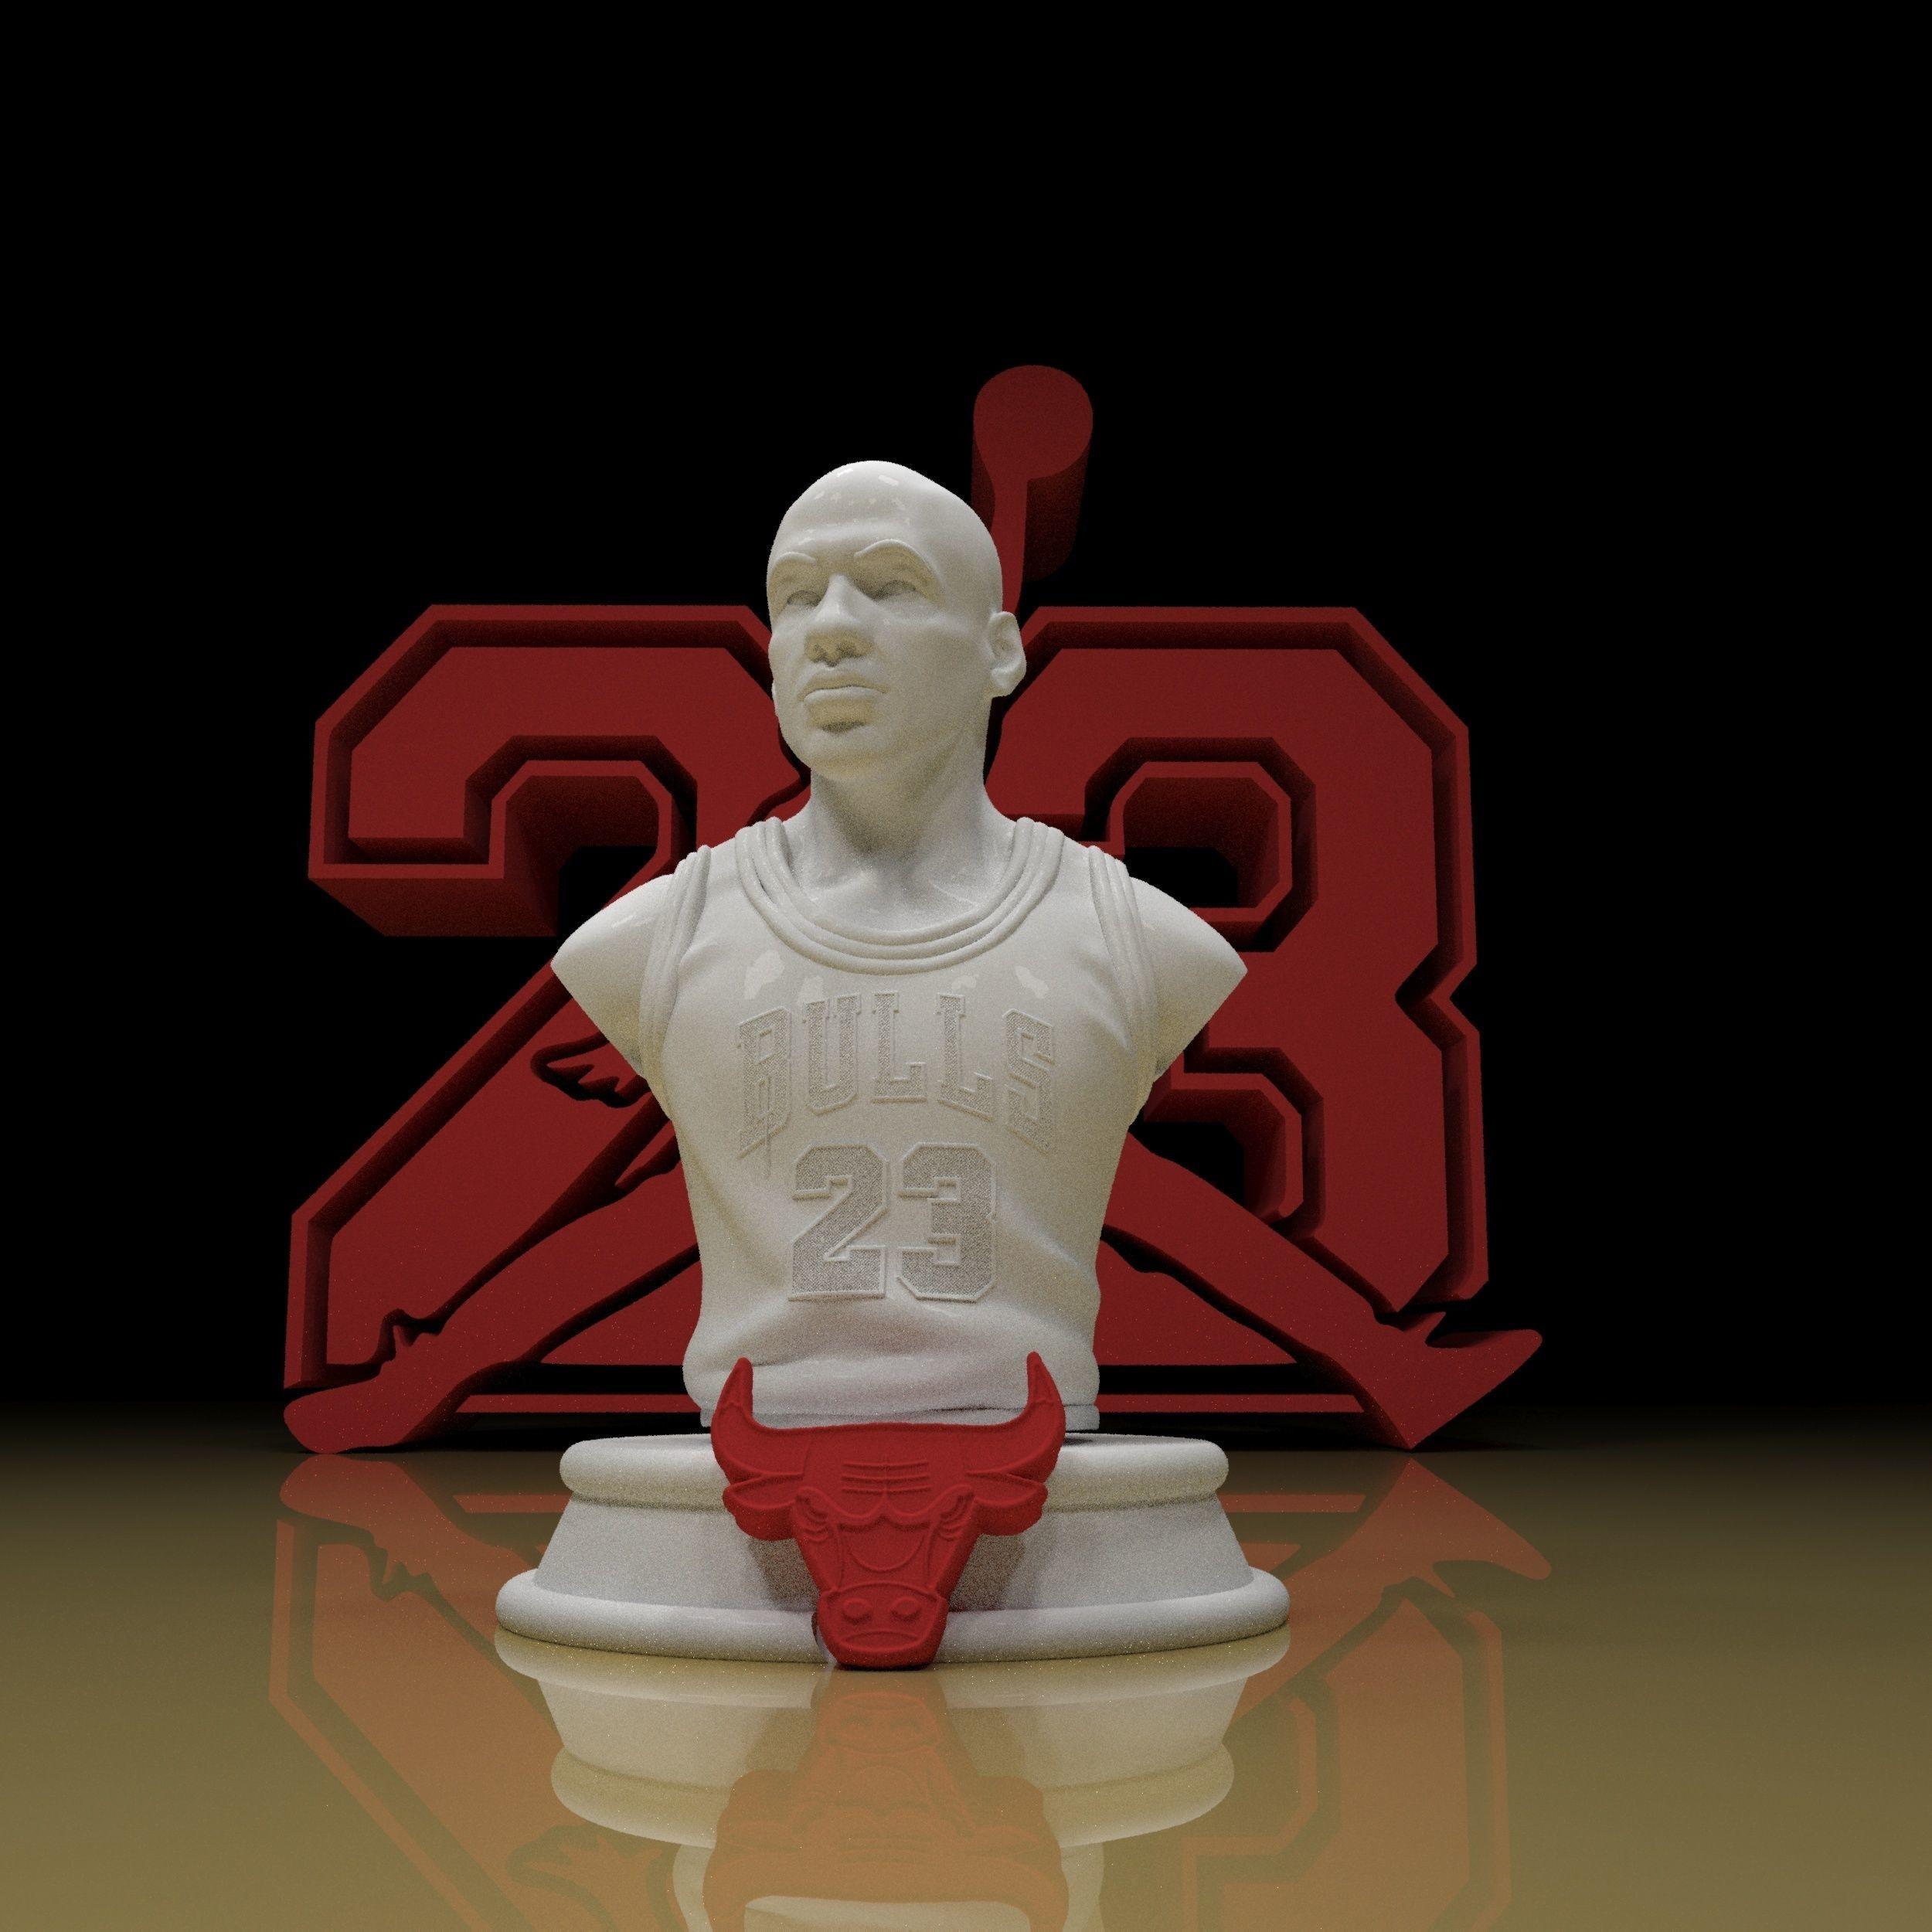 Jordan 23 sculpture 3d model ready for printing